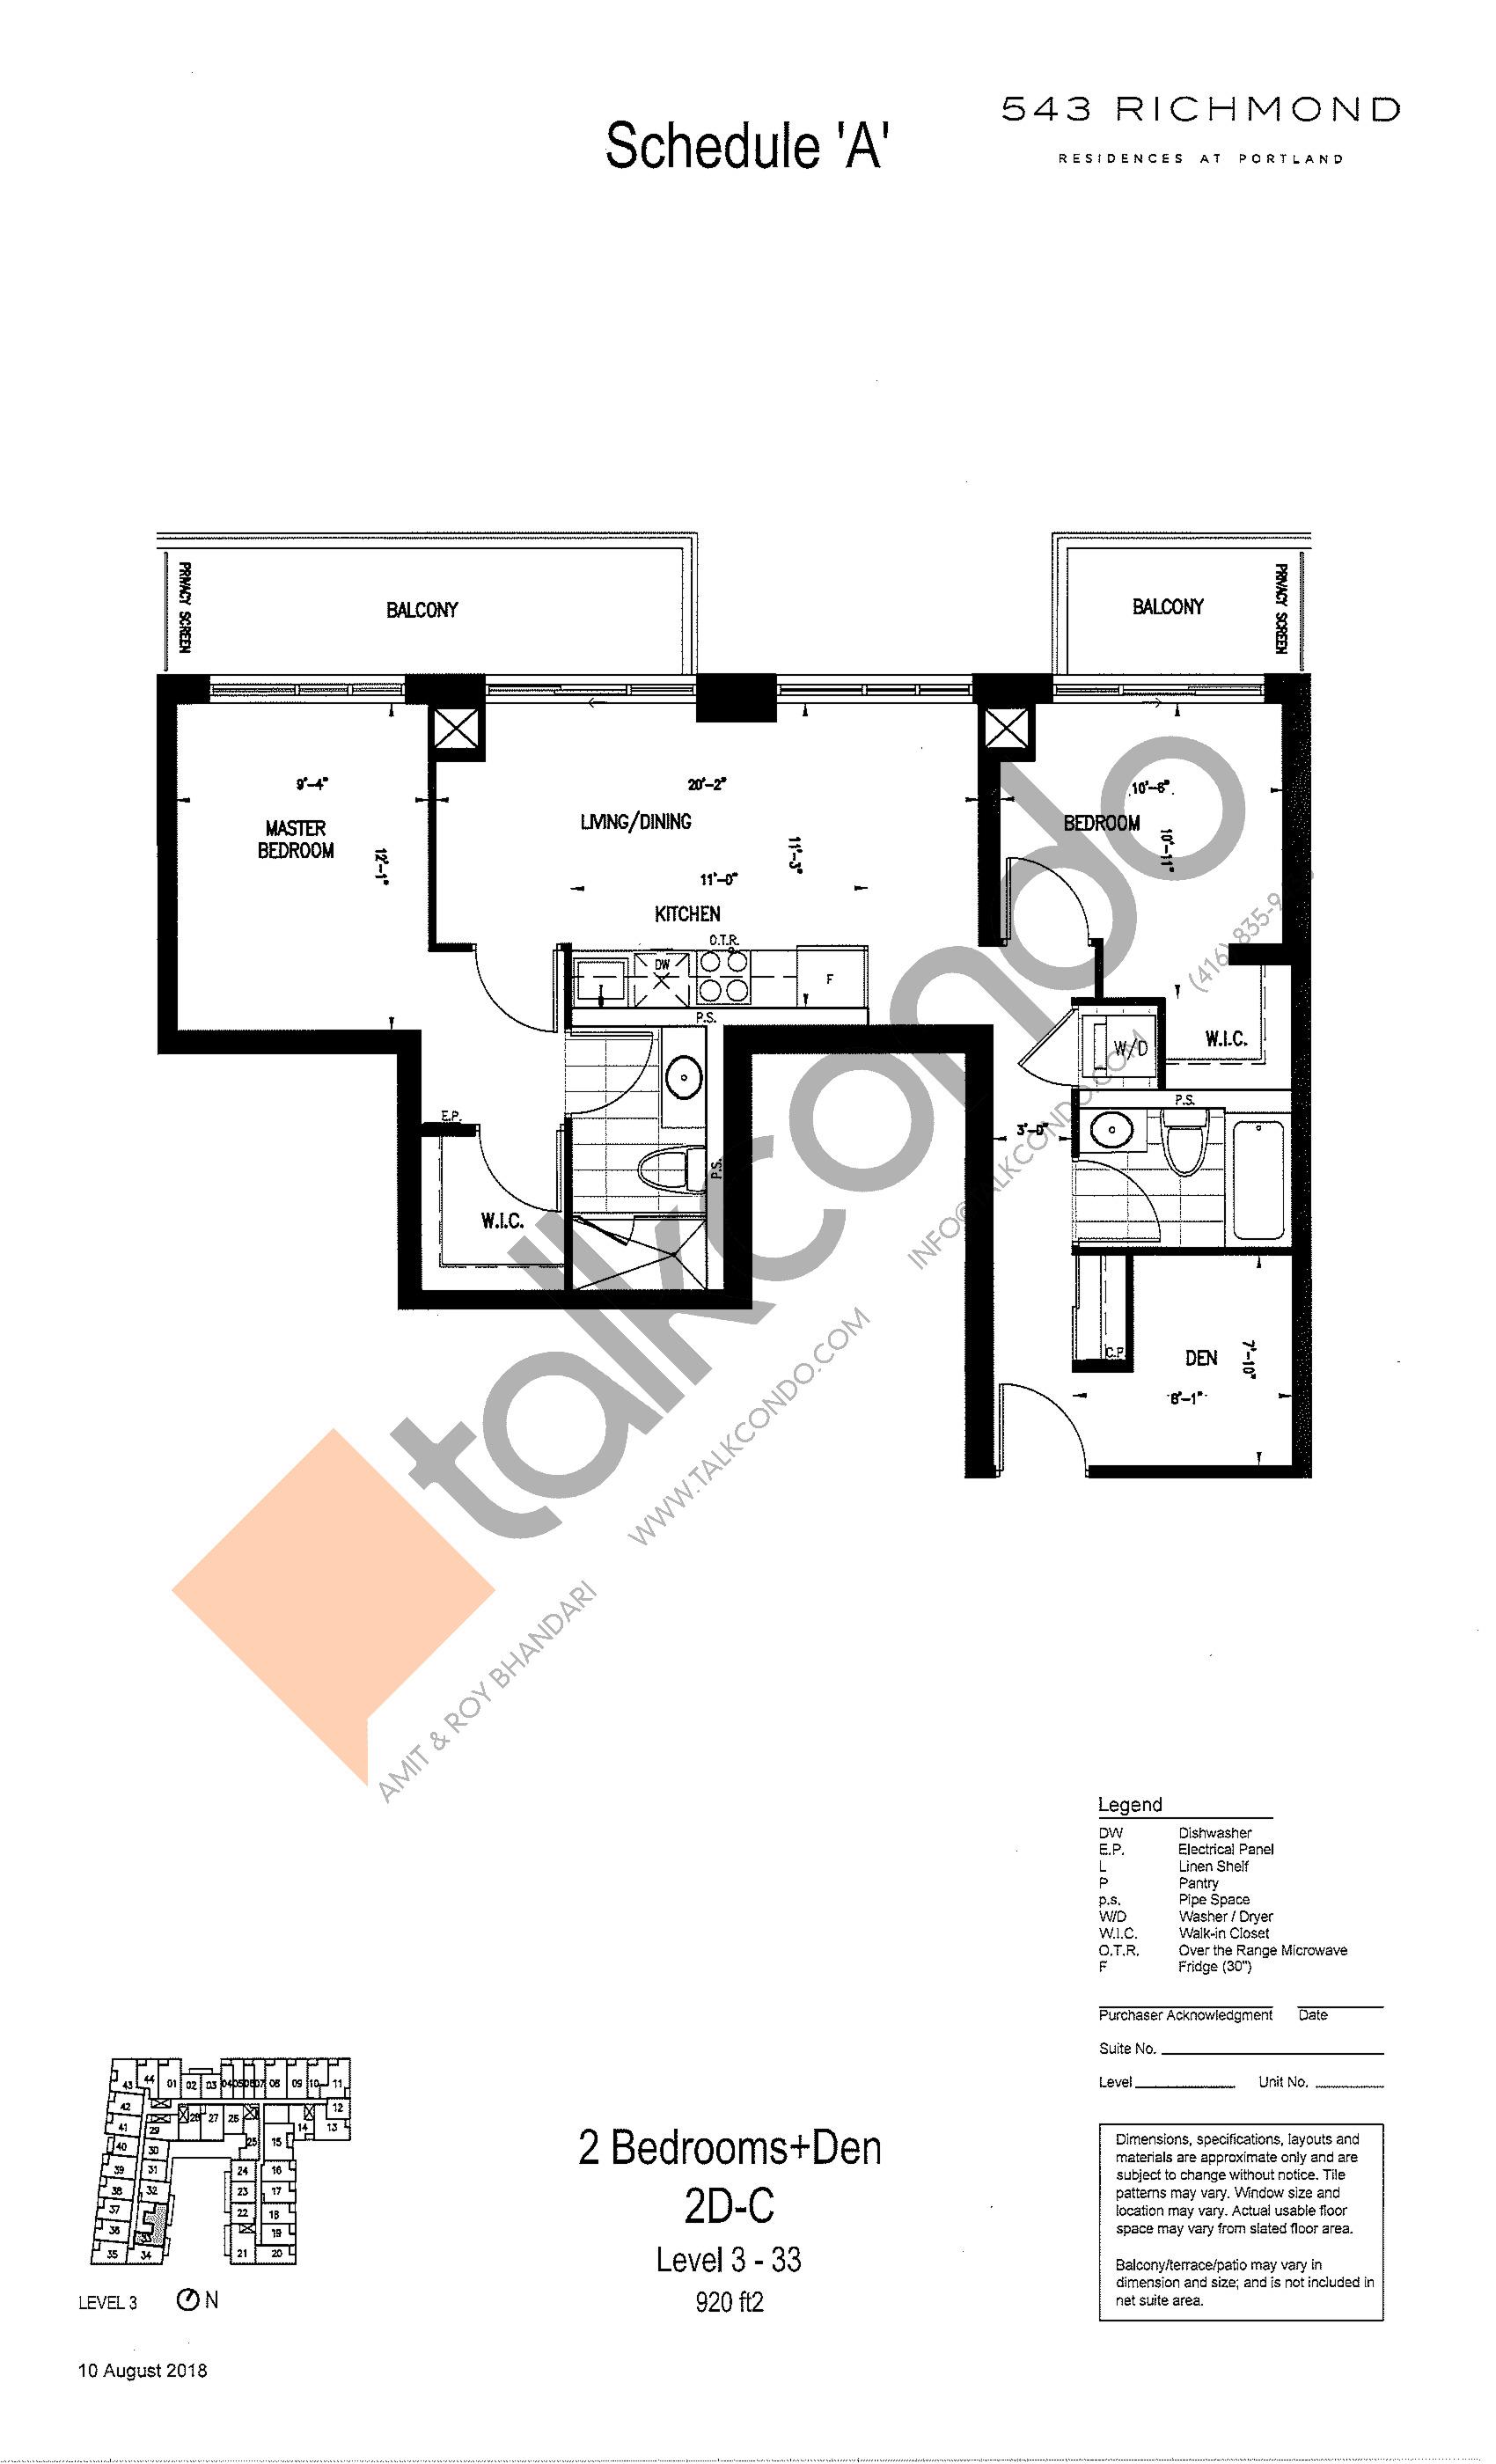 2D-C Floor Plan at 543 Richmond St Condos - 920 sq.ft